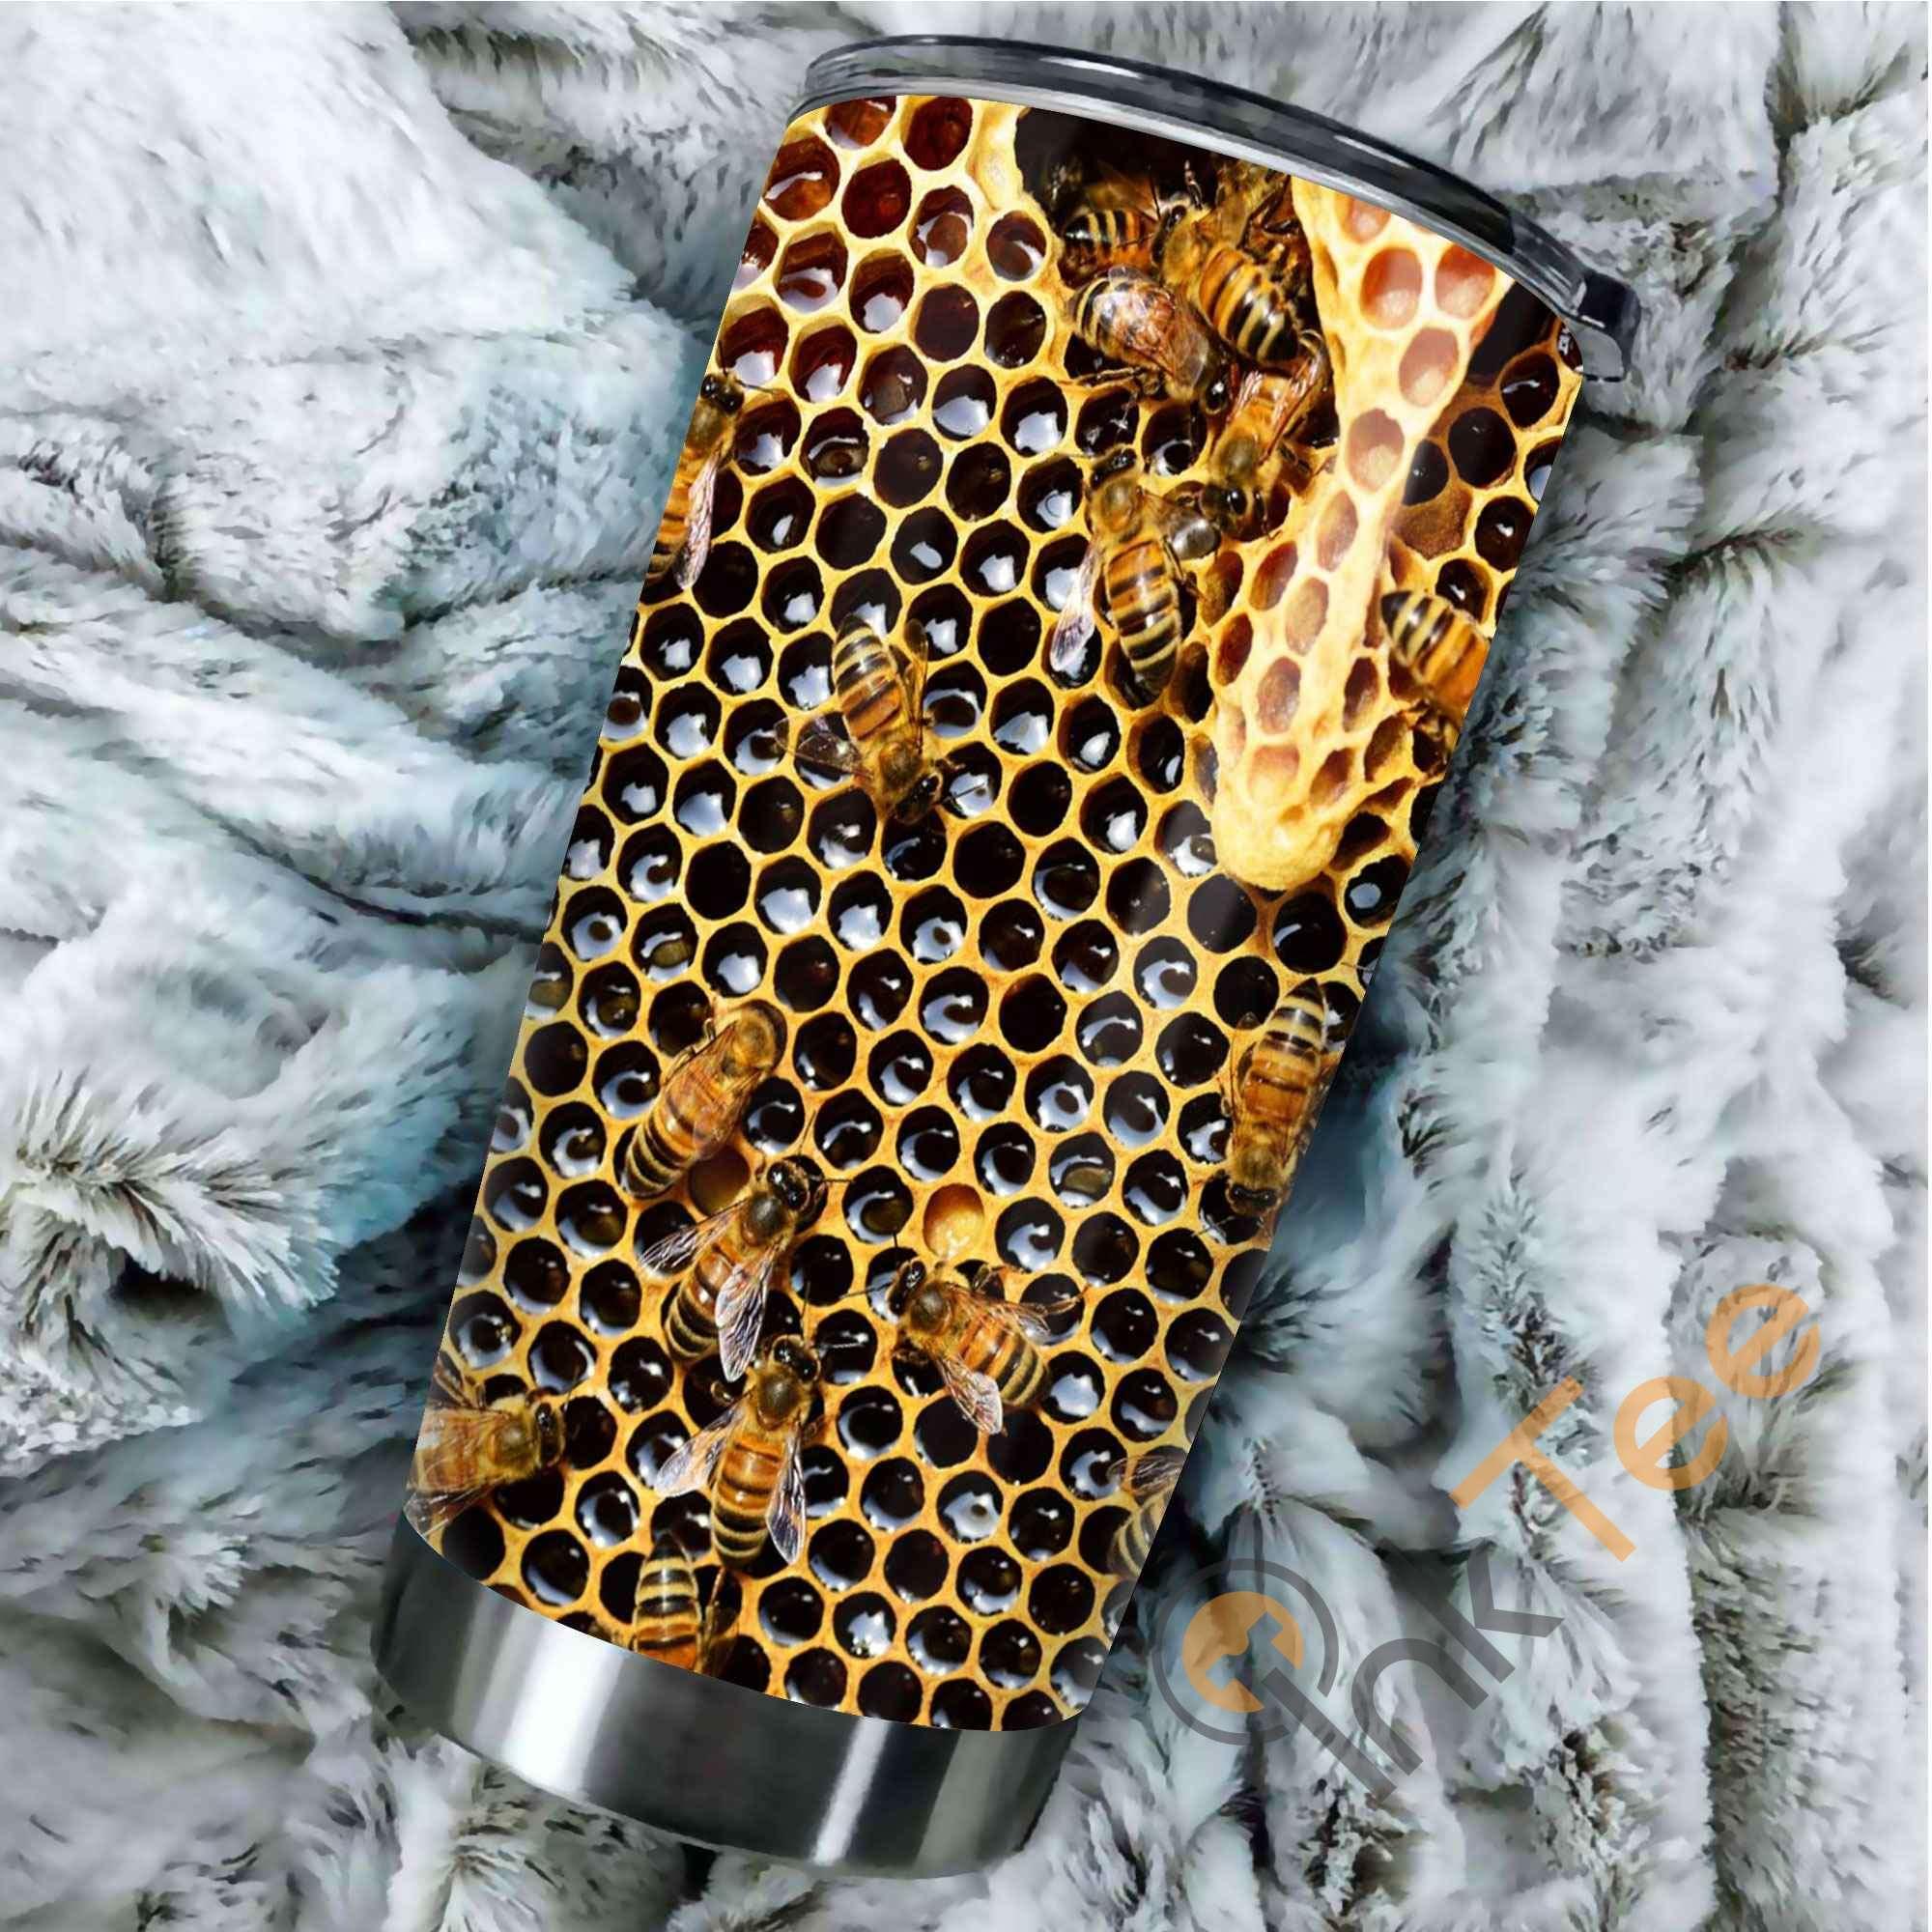 Bees Hive Amazon Best Seller Sku 3870 Stainless Steel Tumbler